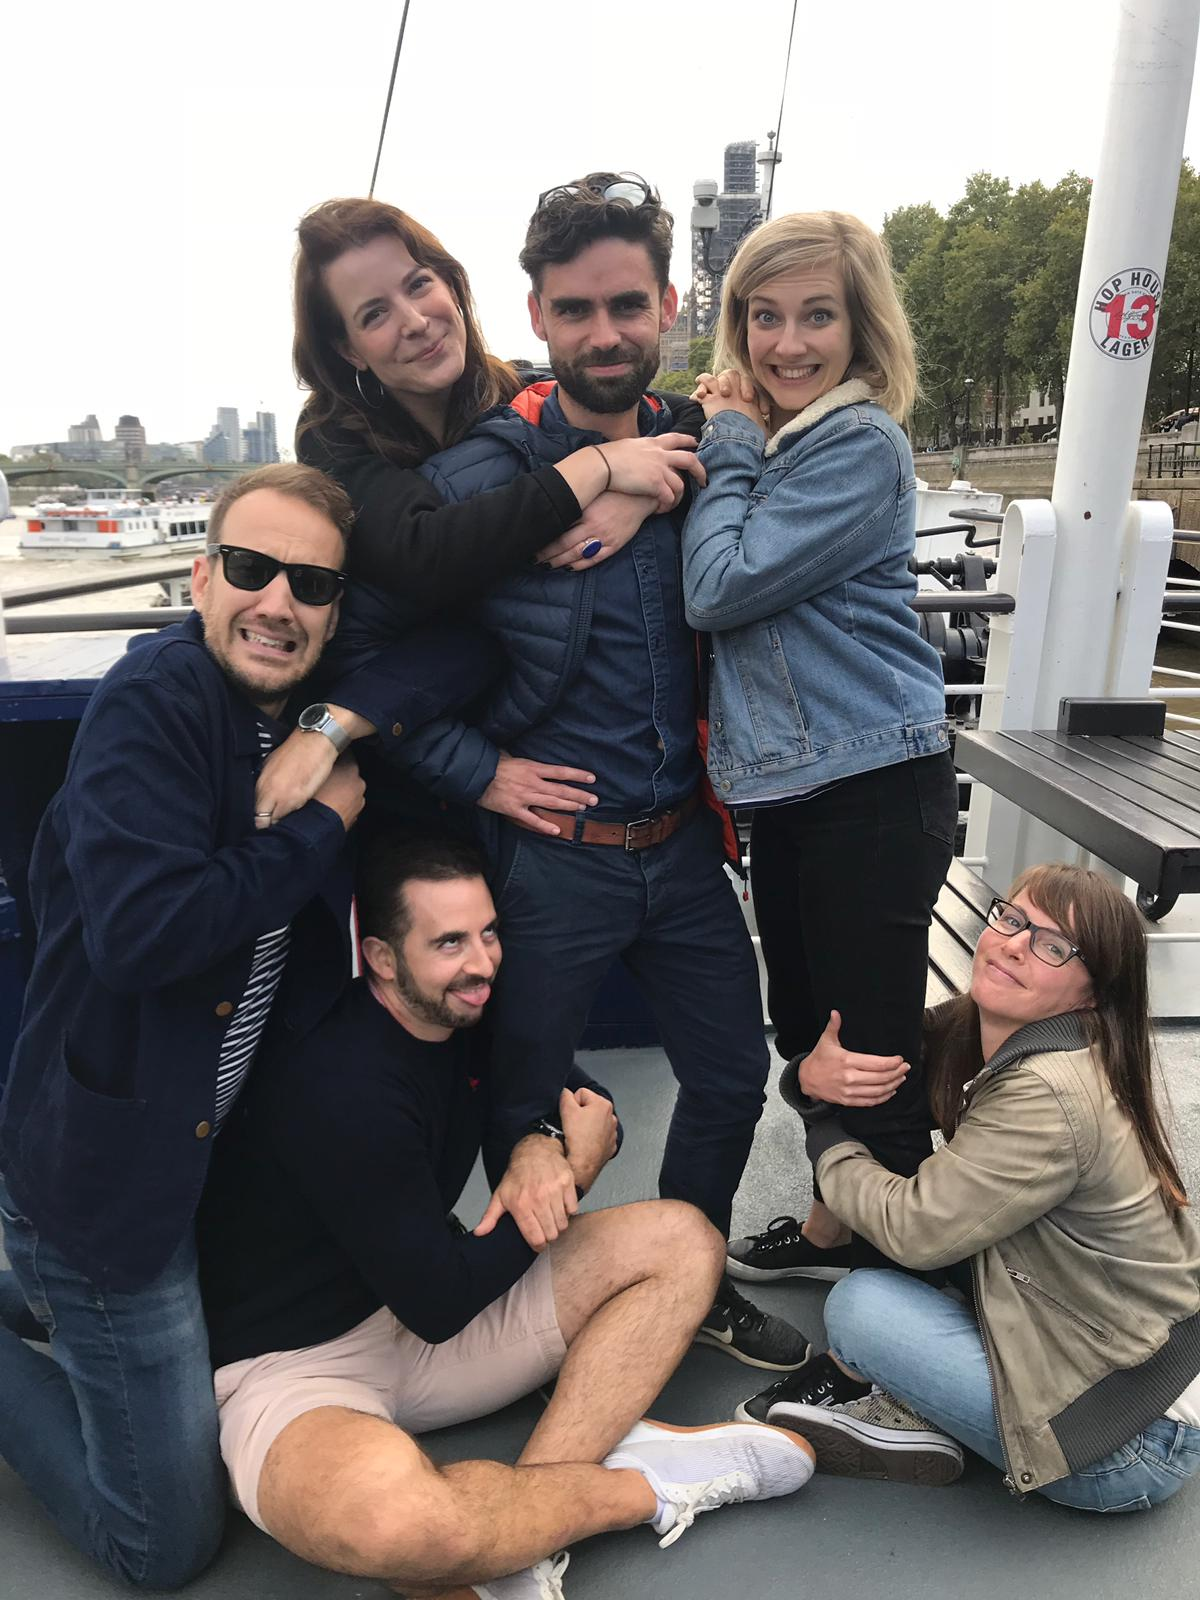 Awkward family photo challenge at a 30th celebration